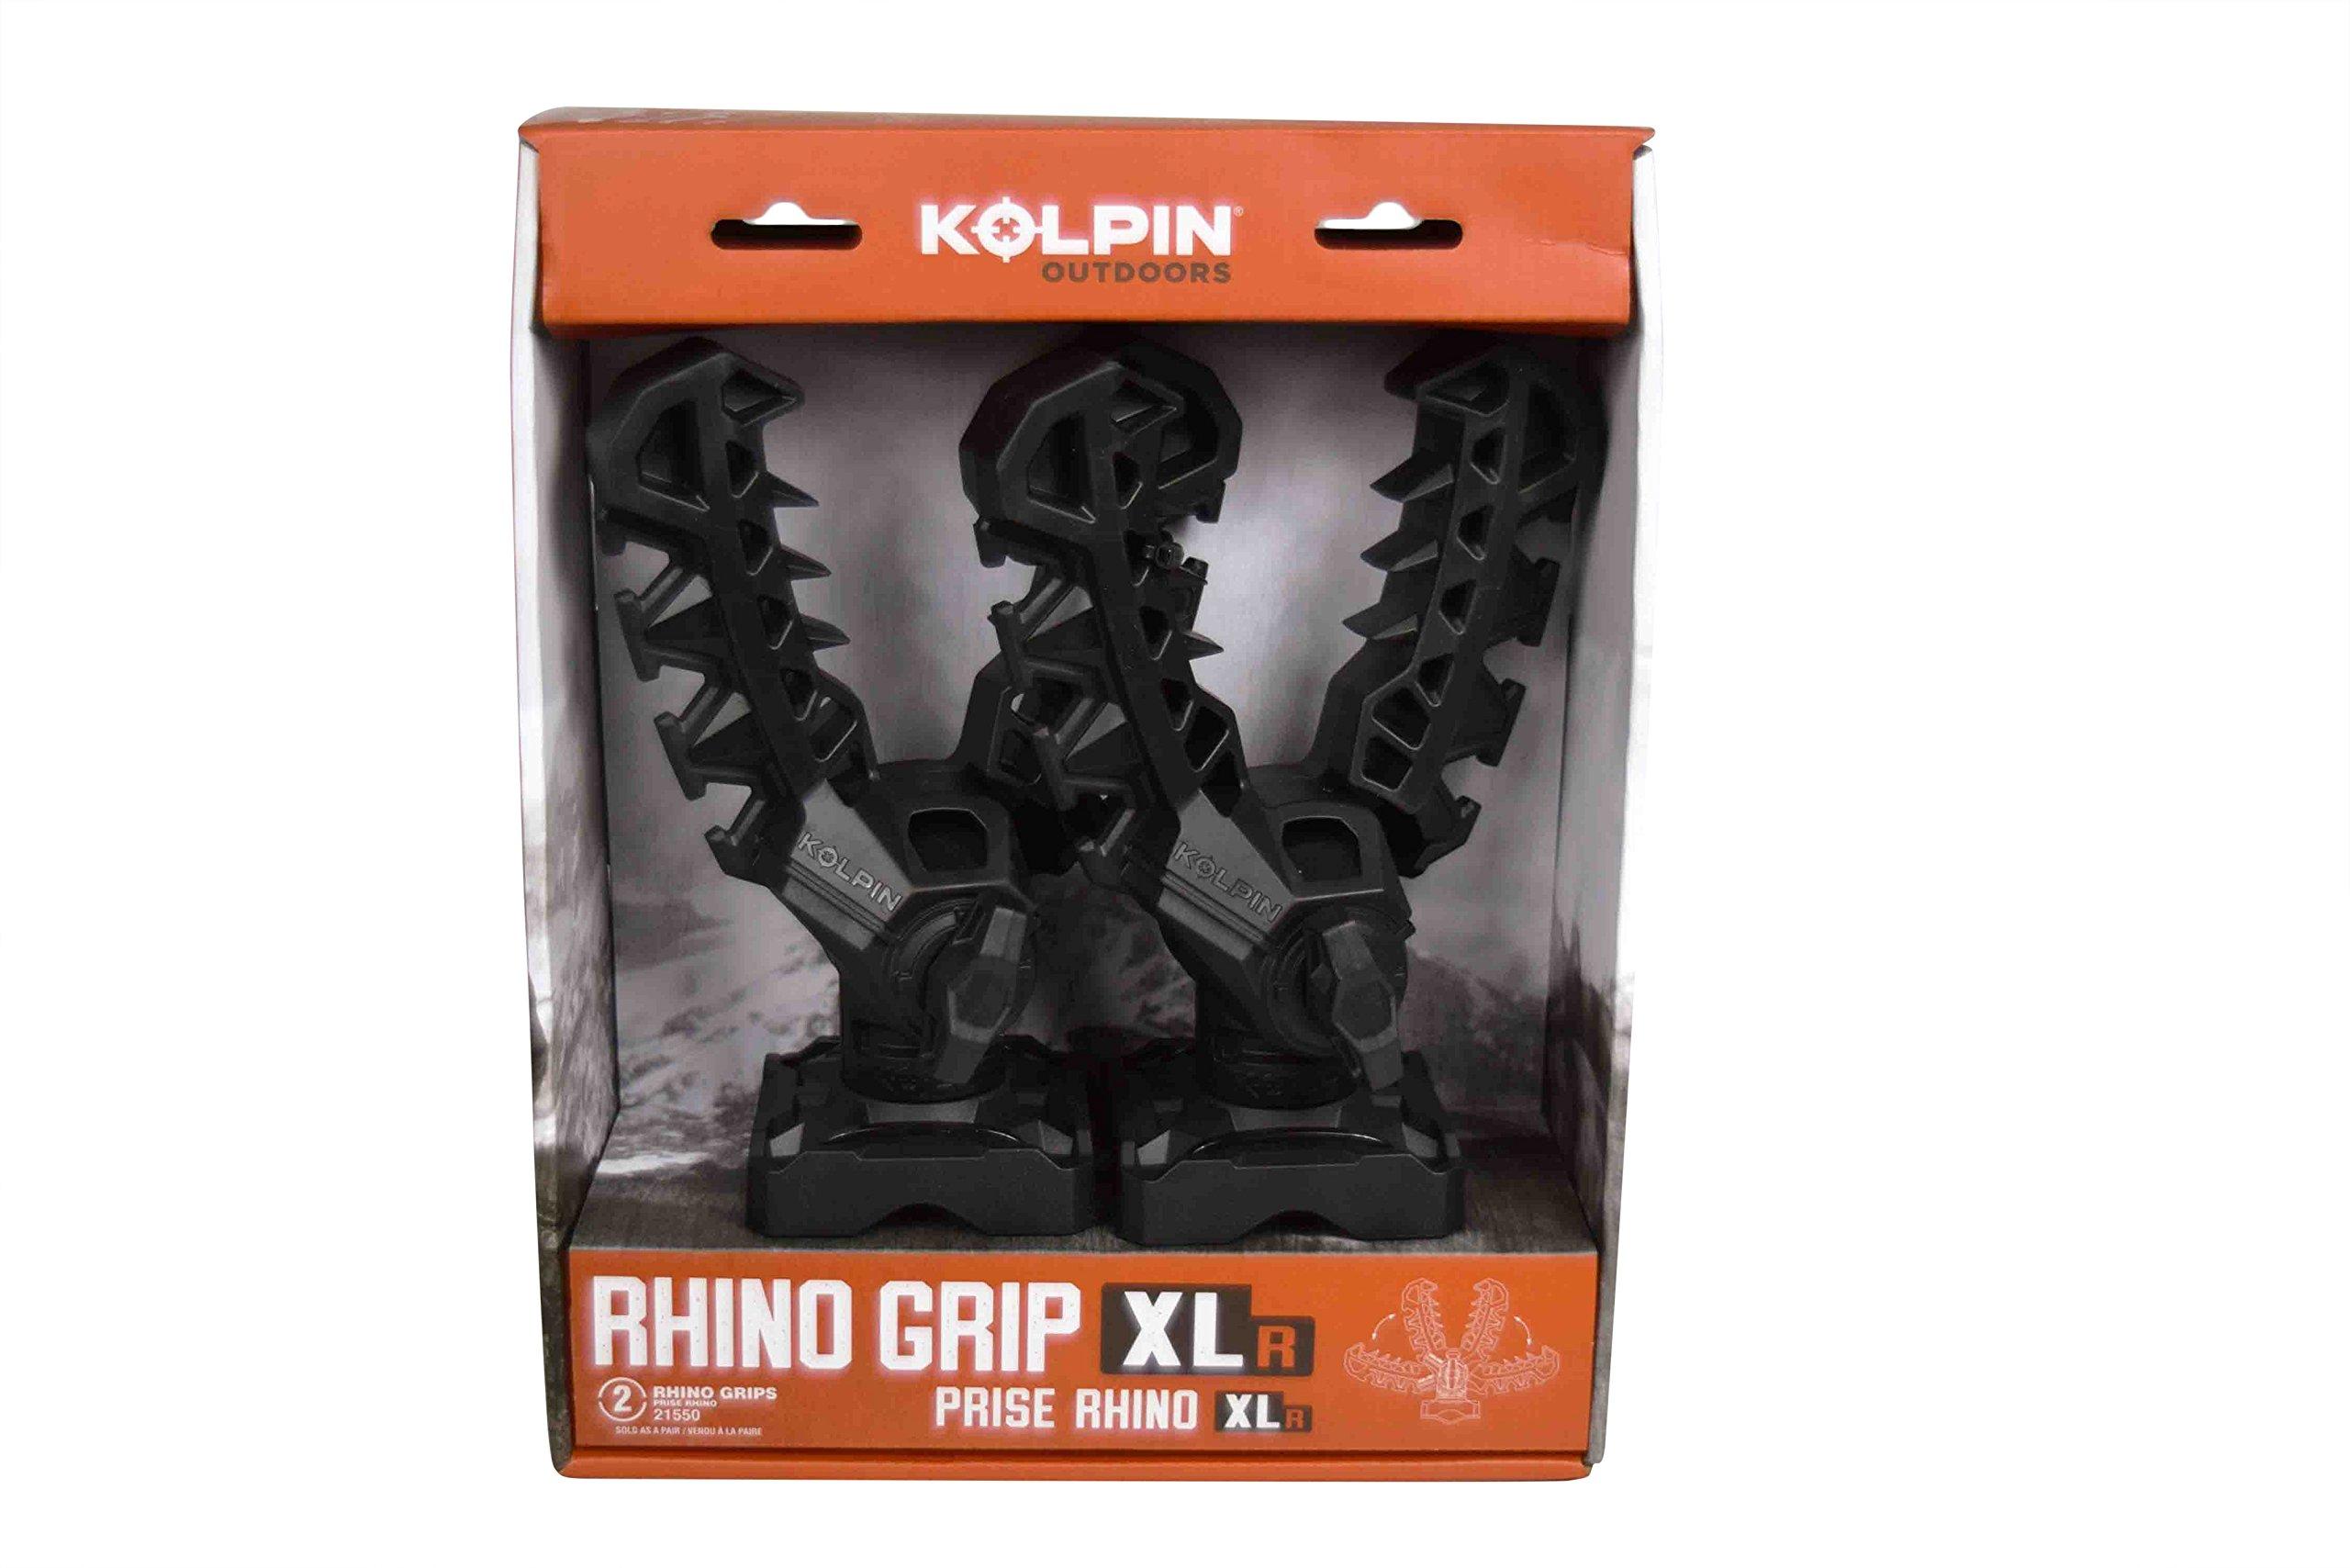 Kolpin 21550 Universal Rhino Grips XLR - Pair